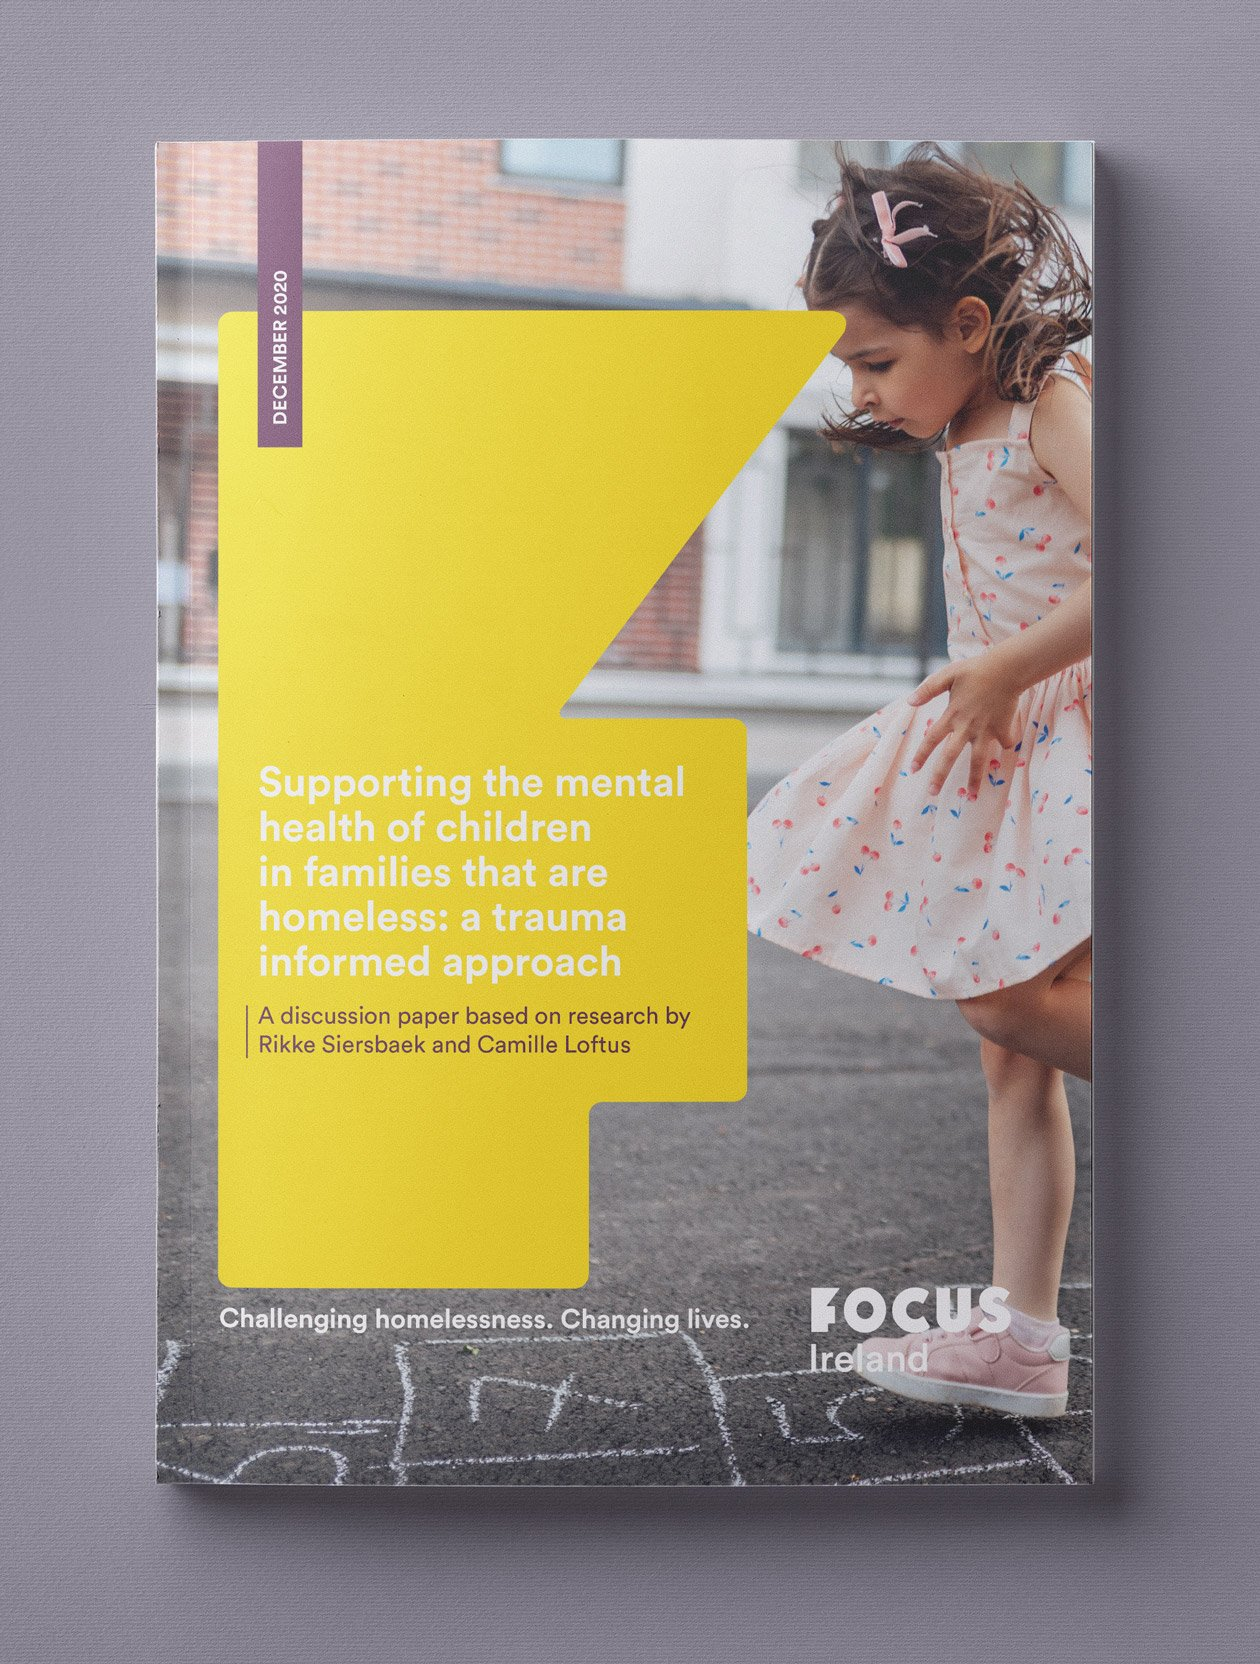 cover focus ireland therapeutics report design by pixelpod